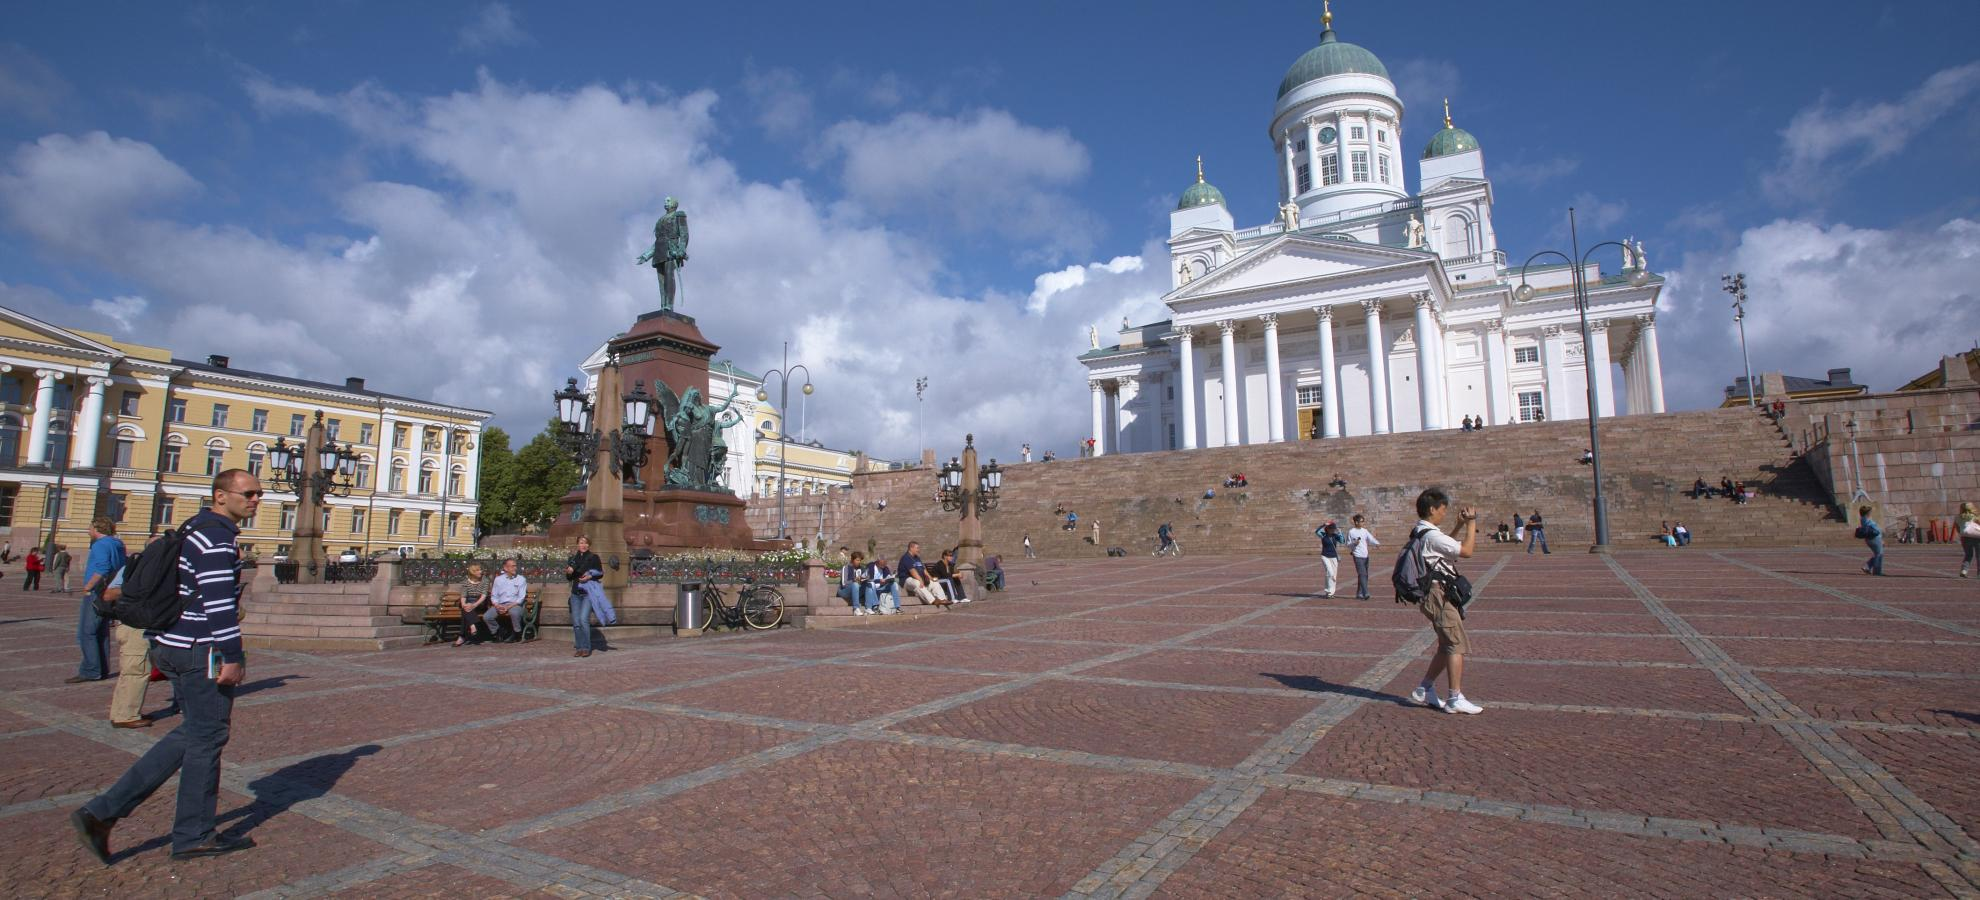 Senate Square My Helsinki